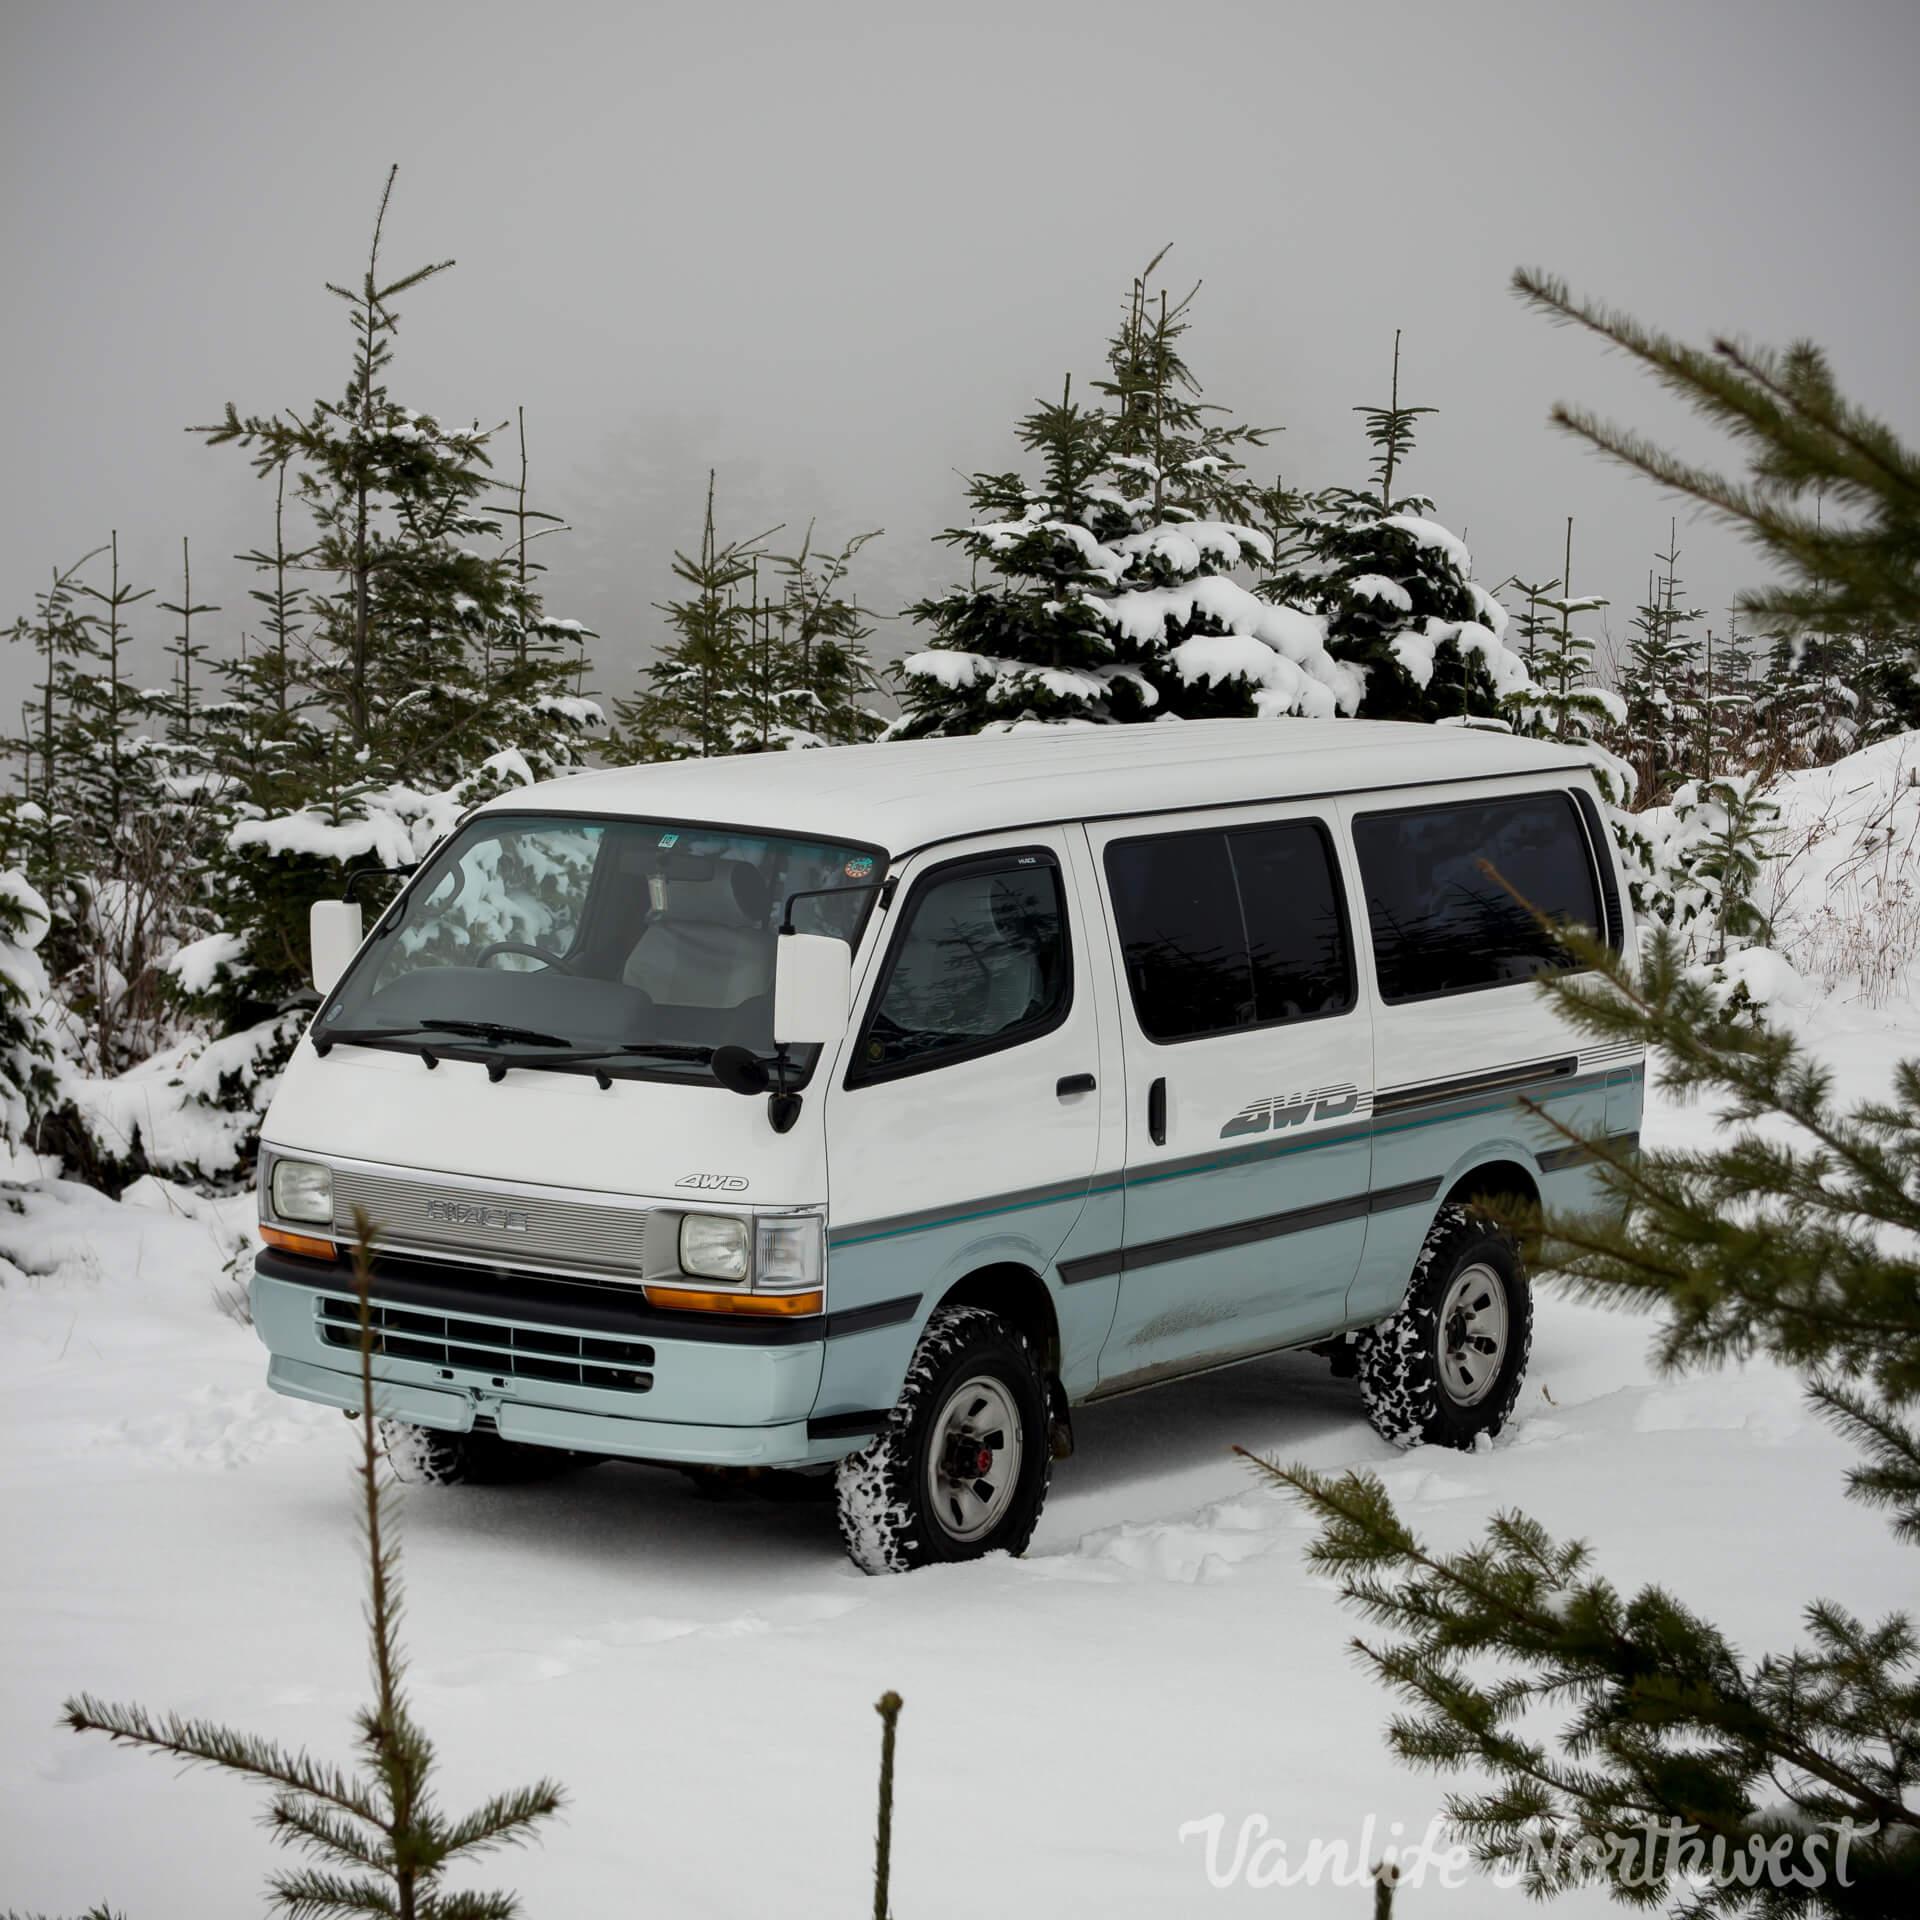 ToyotaHiaceLH119-JoeH-12.jpg